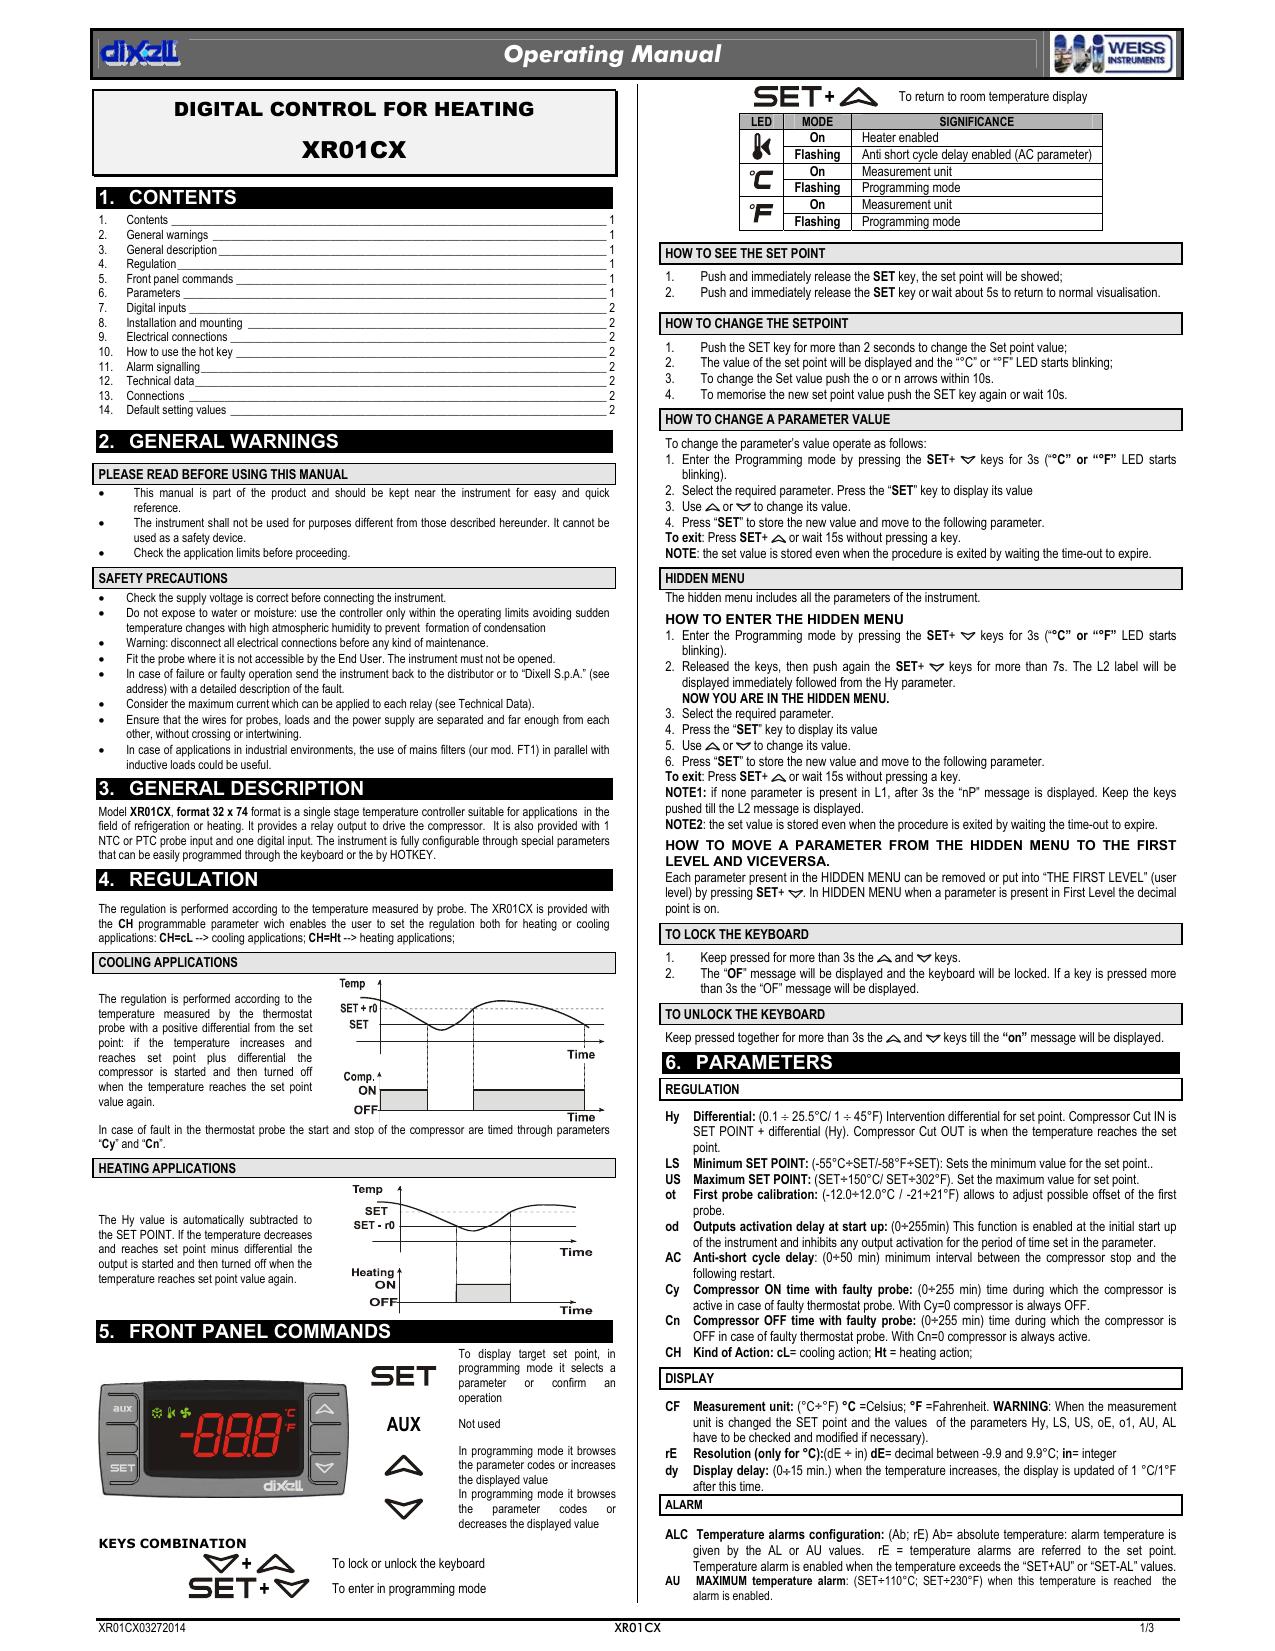 Operating Manual Xr01cx Manualzz